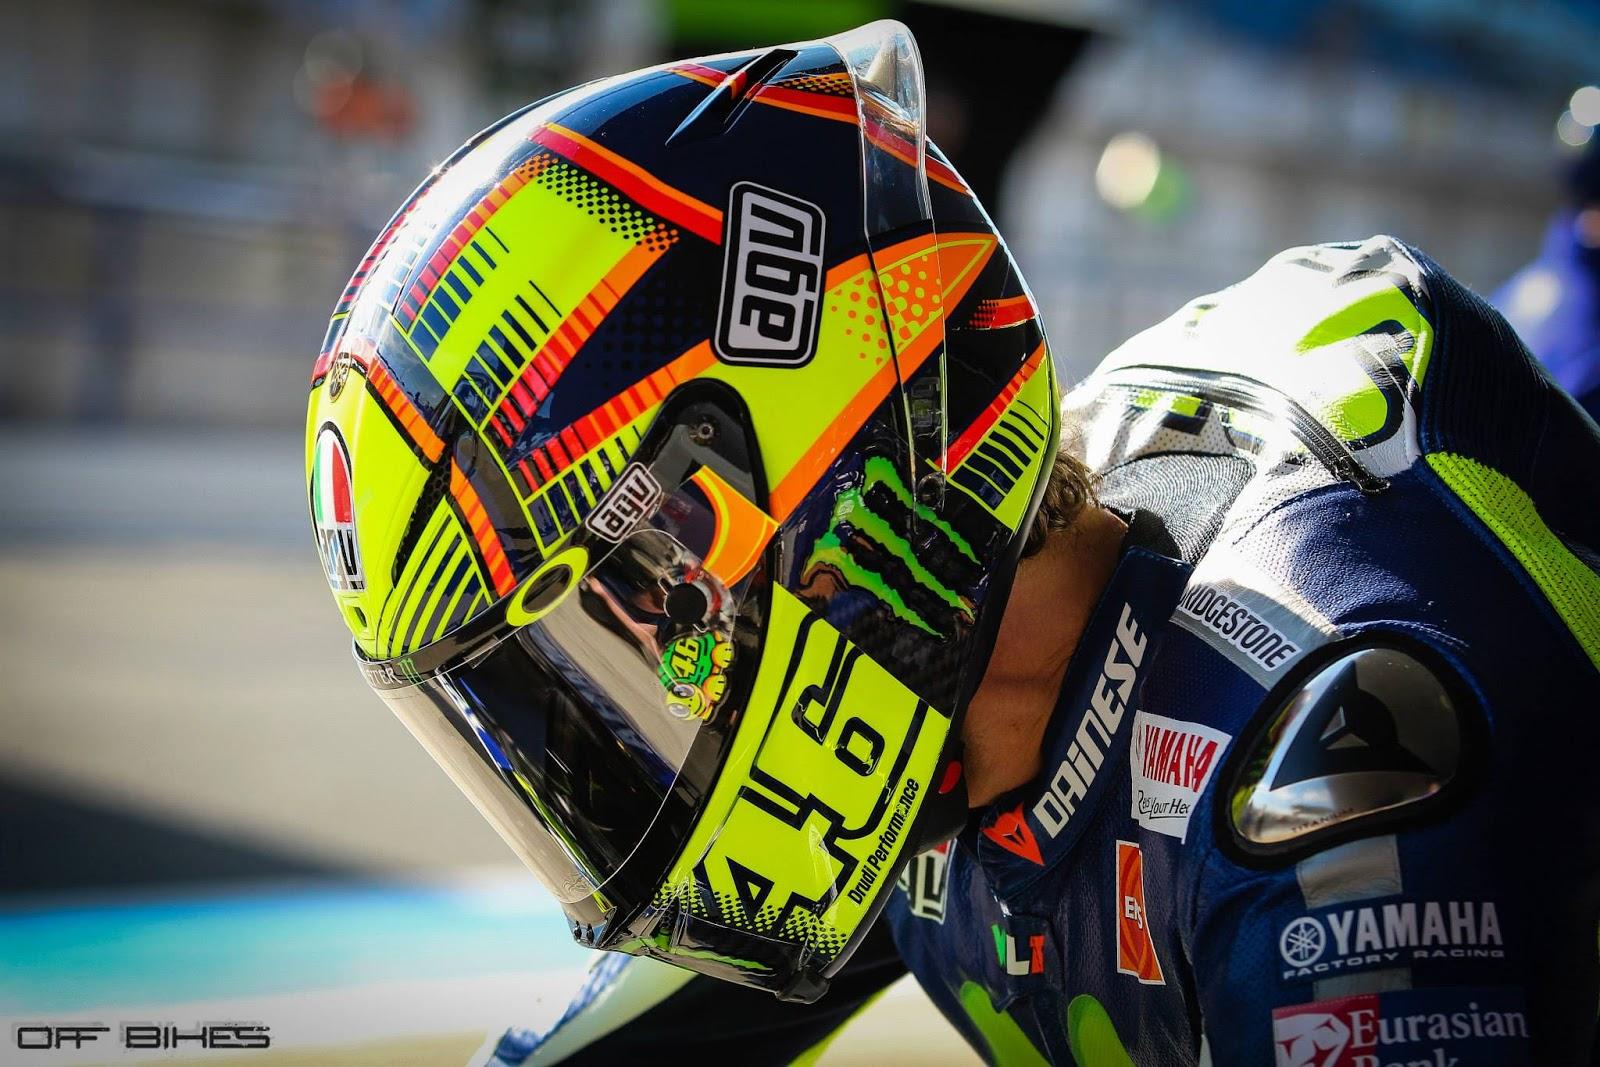 Agv PistaGP Valentino Rossi 2015 By Drudi Performance